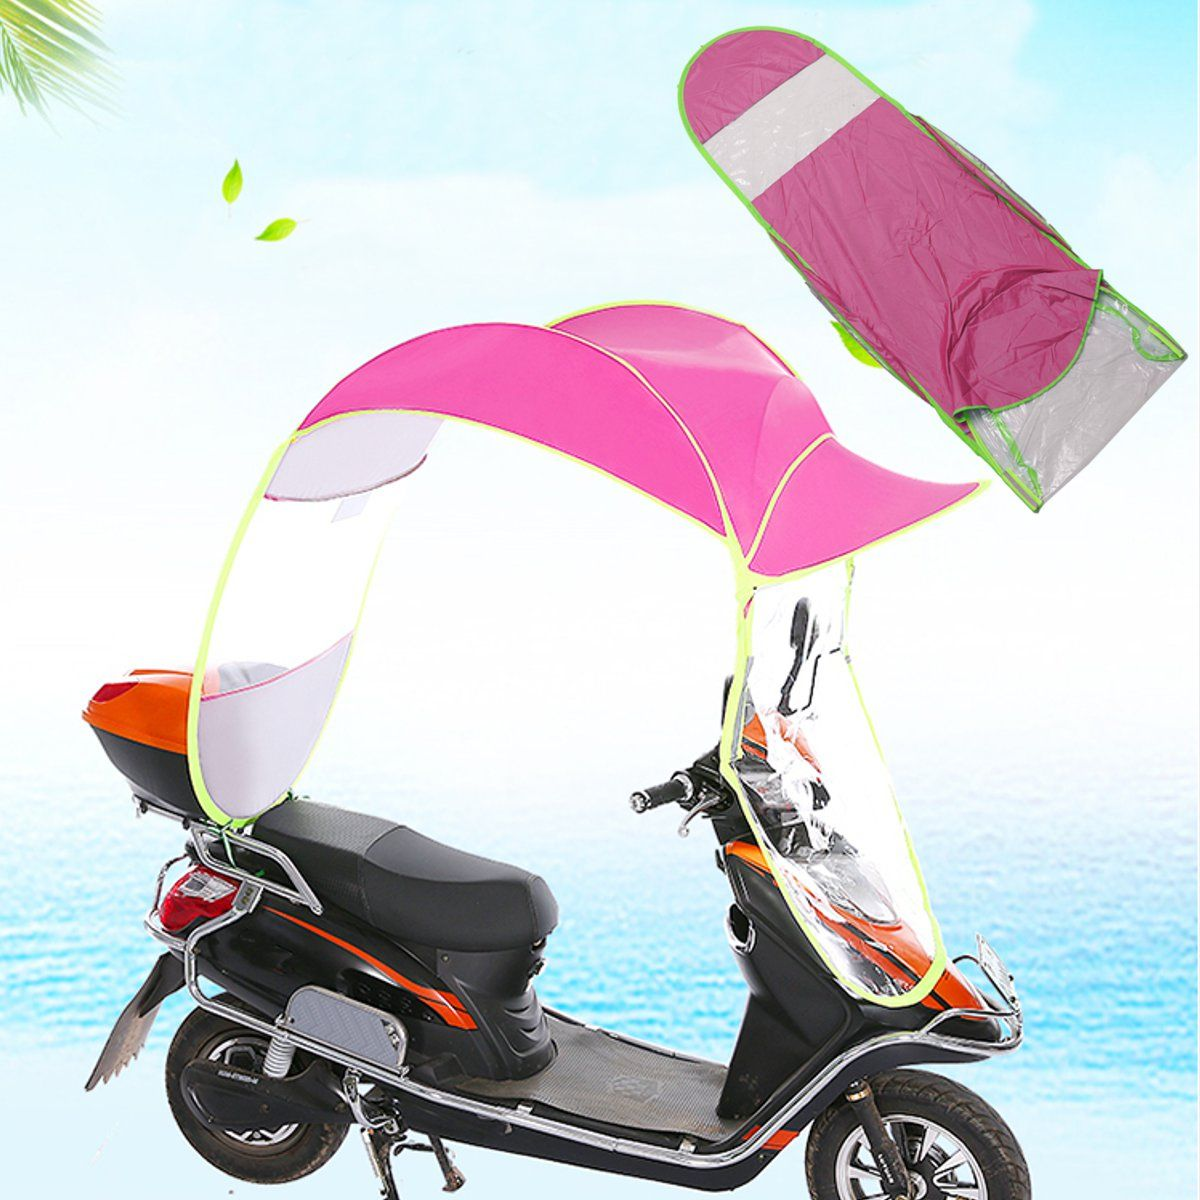 Mofaner Мотоцикл Скутер дождевик Защита от солнца Тенты мотоцикл электромобиль зонтик плащ пончо крышка приют 2.8*0.8*0.7 м